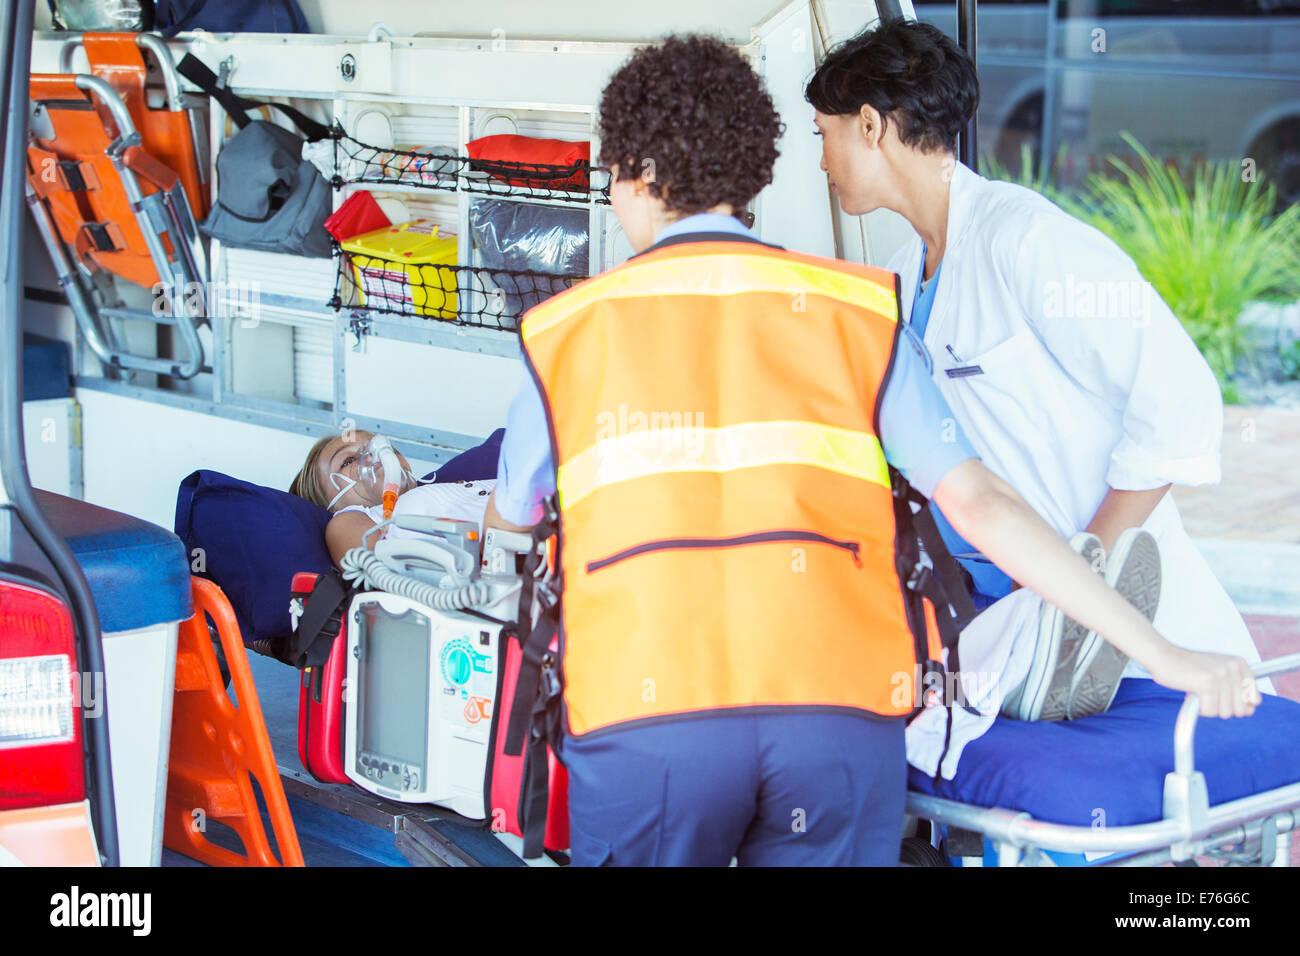 Paramedics wheeling patient out of ambulance - Stock Image